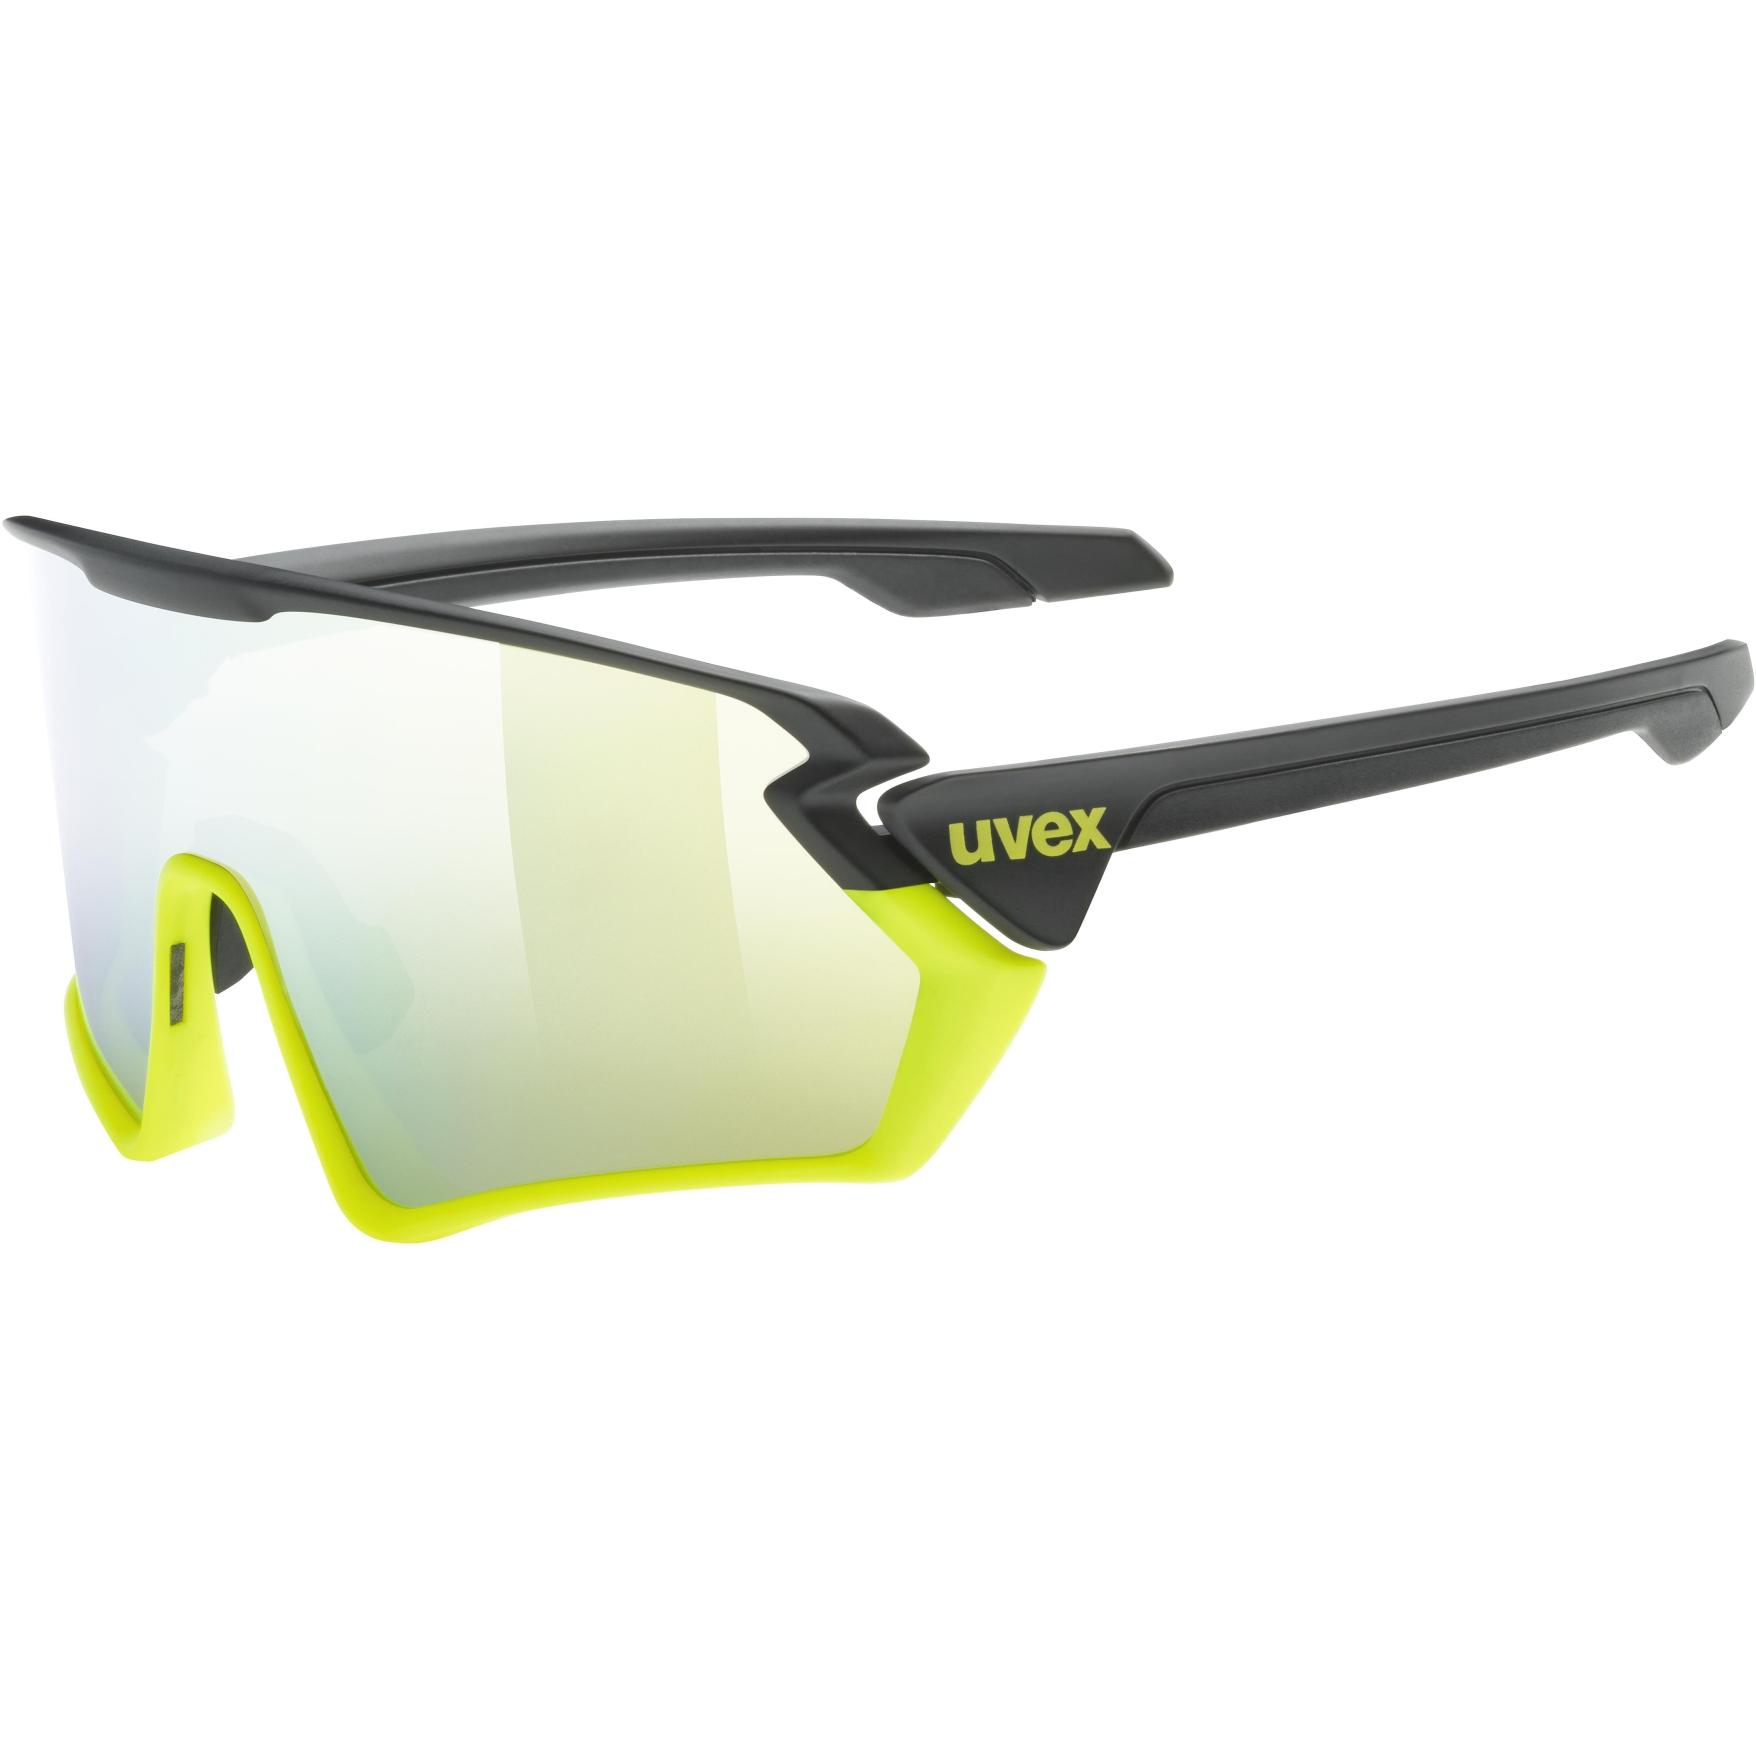 Uvex sportstyle 231 Glasses - black yellow mat/mirror yellow